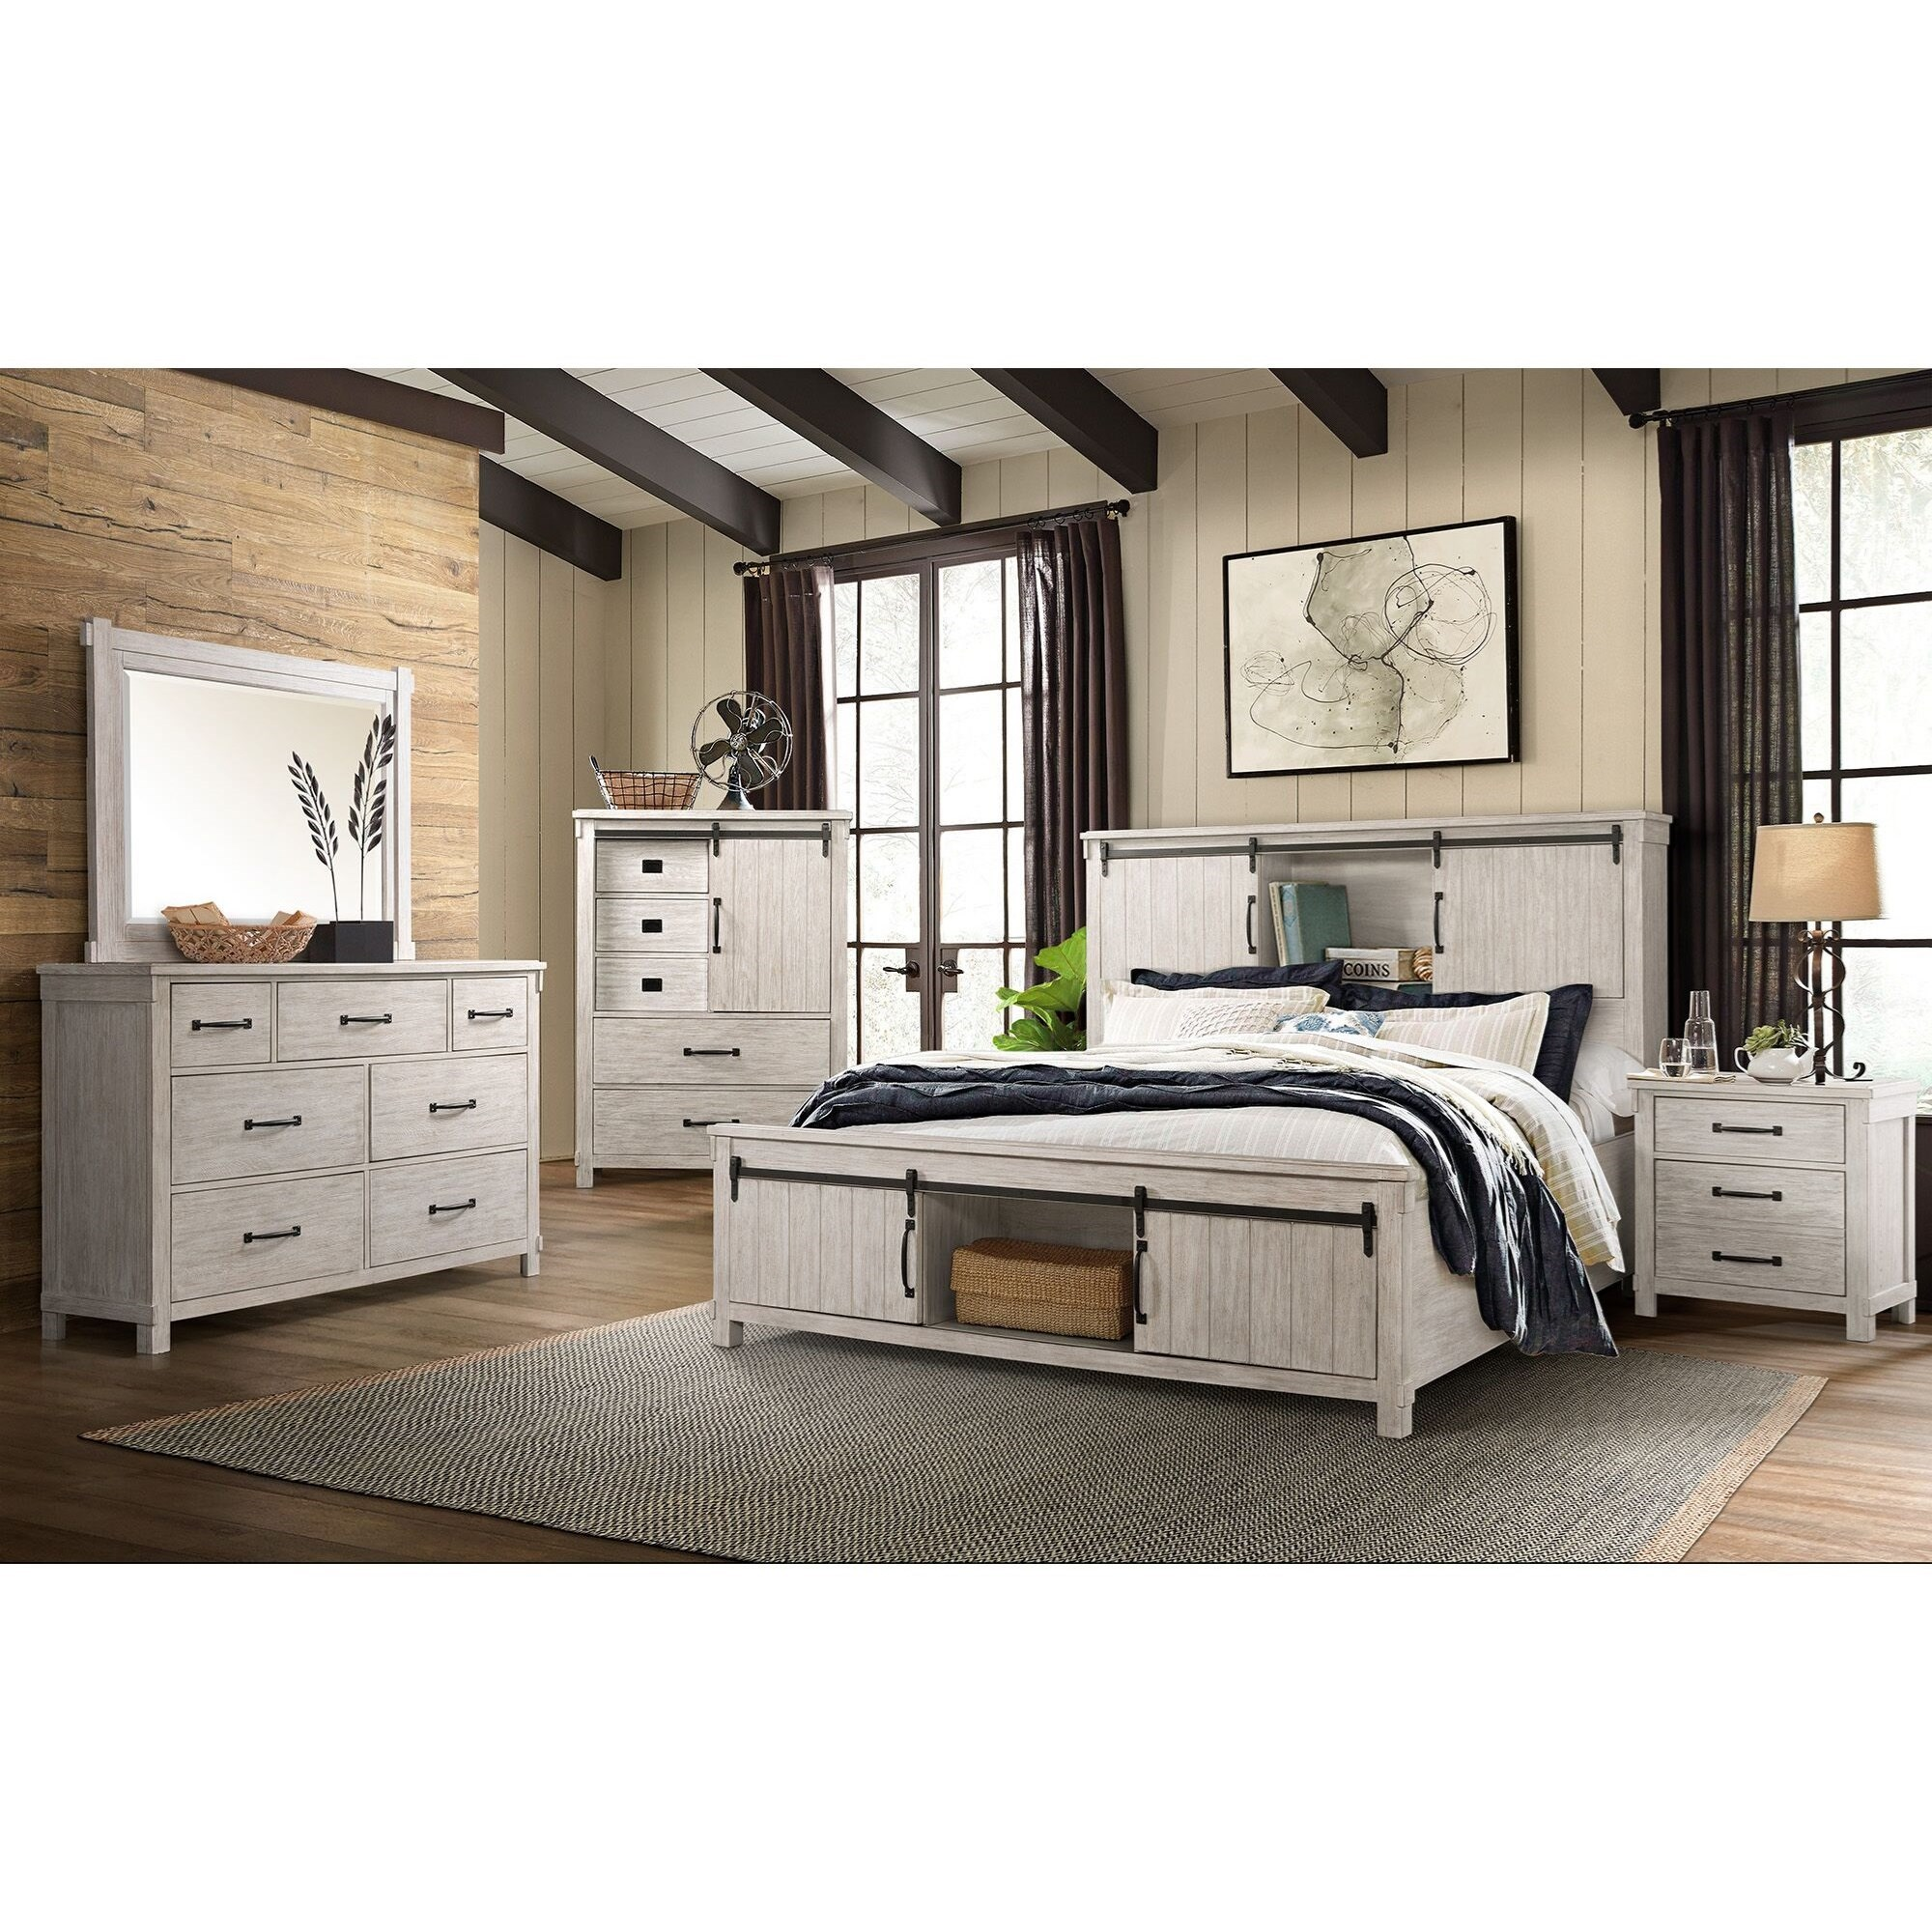 Scott Queen Bedroom Group by Elements International at Bullard Furniture